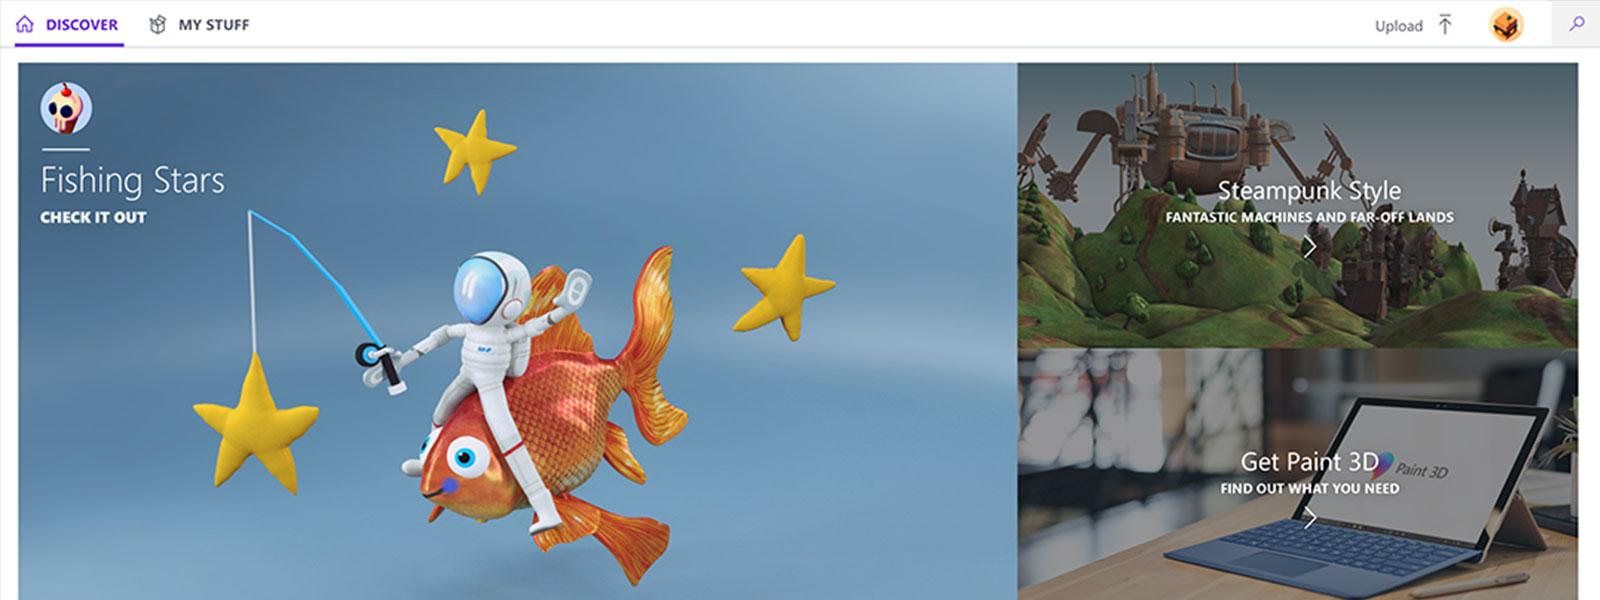 Fishing stars Windows Paint 3D image